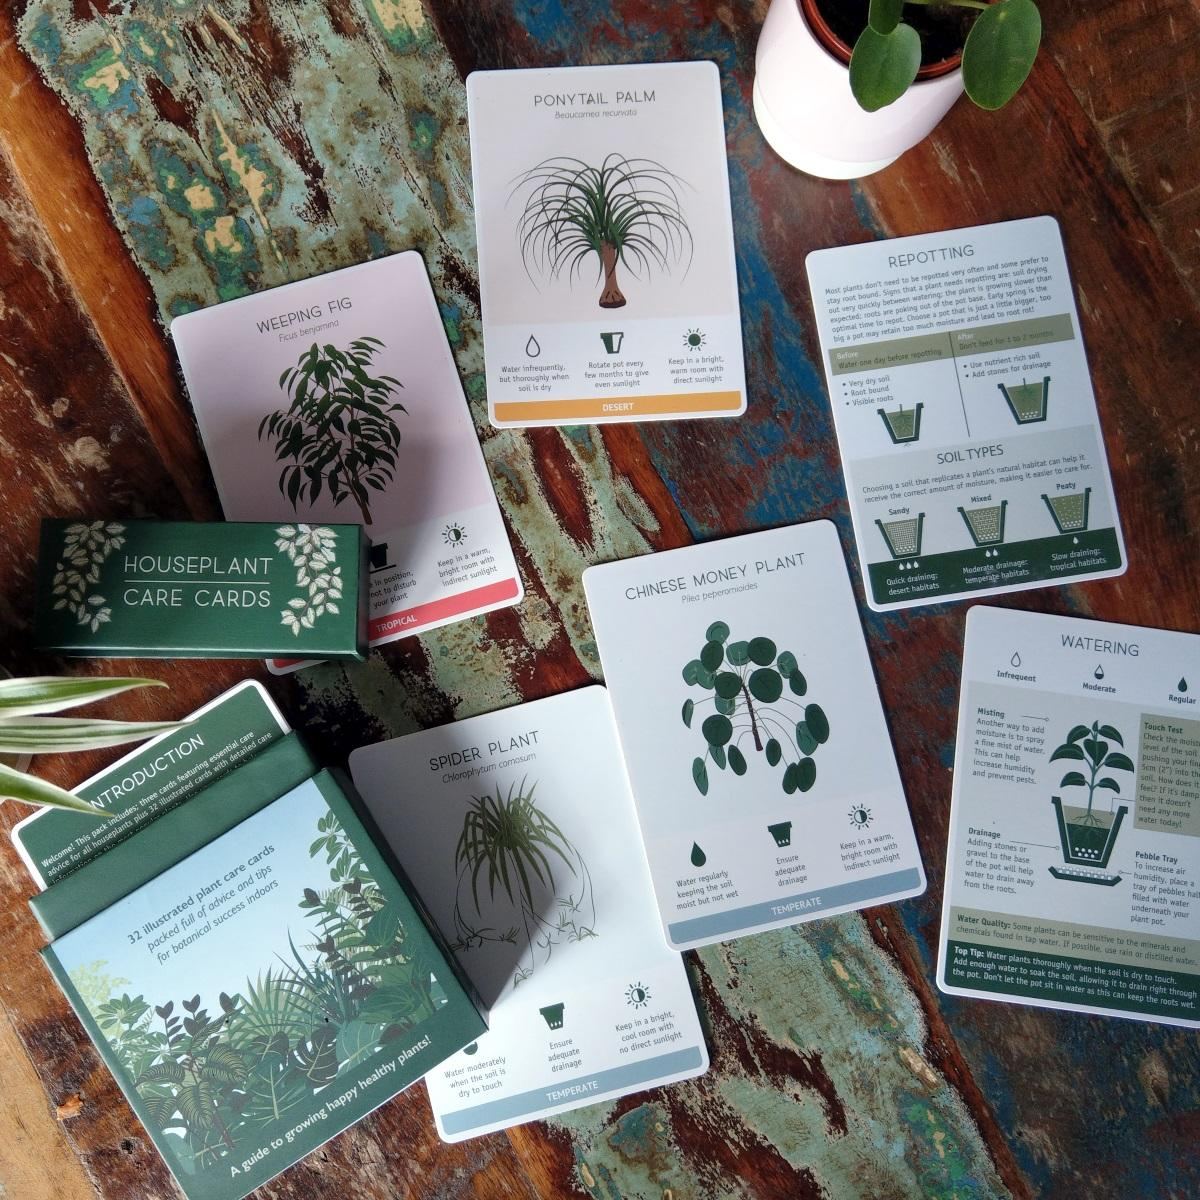 Miraculous Houseplant Care Cards Interior Design Ideas Clesiryabchikinfo